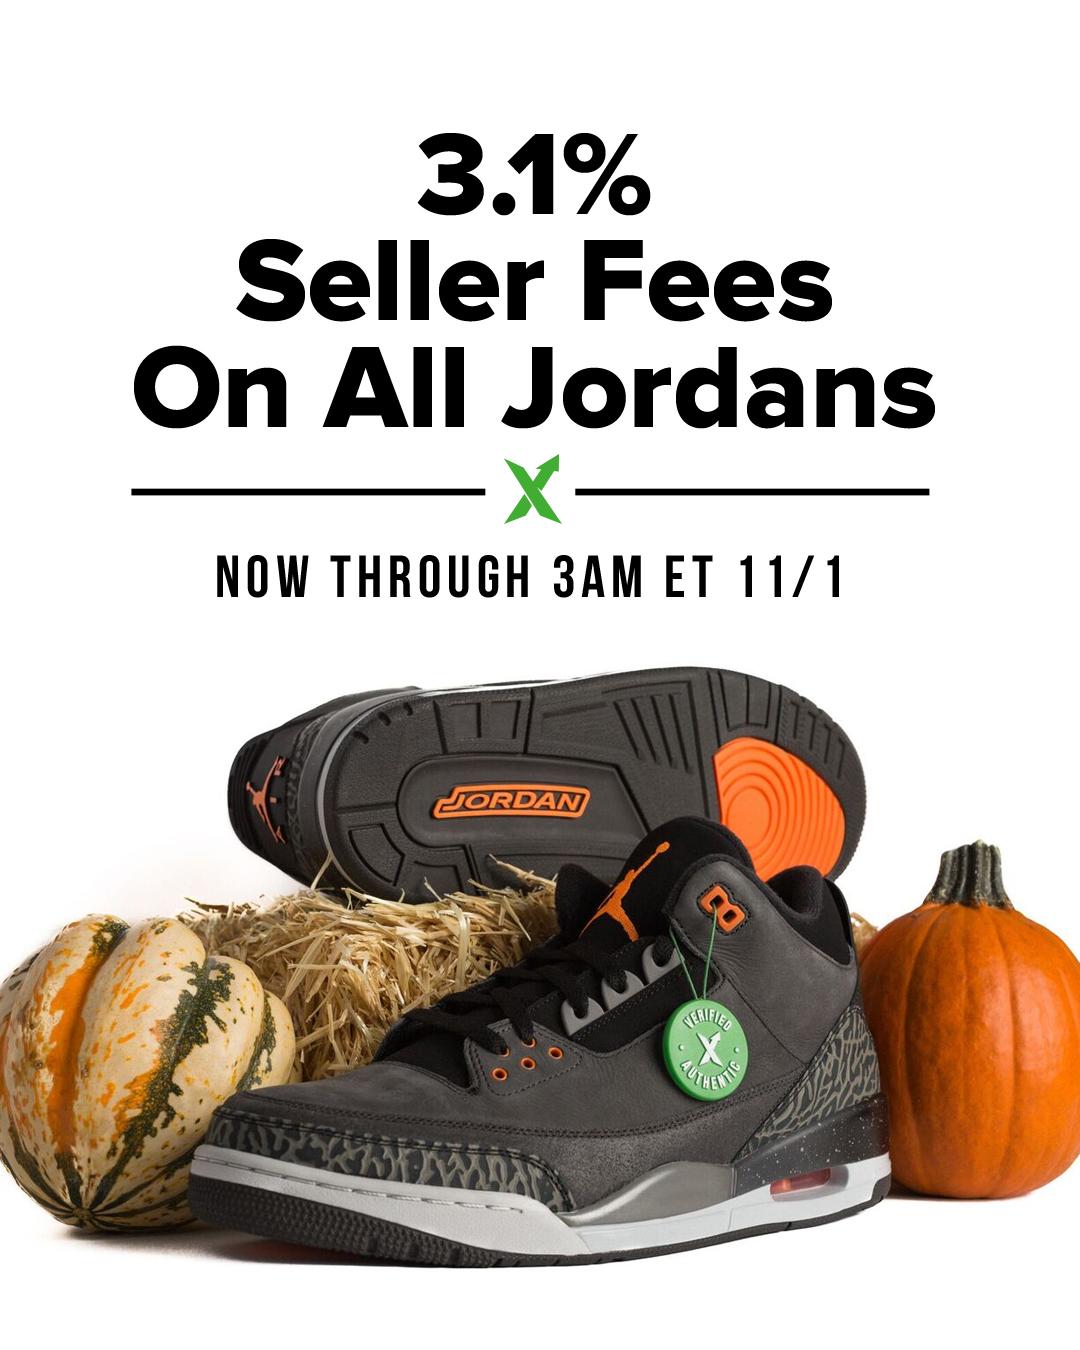 Happy Halloween! — 3.1% Seller Fee Starts Now!